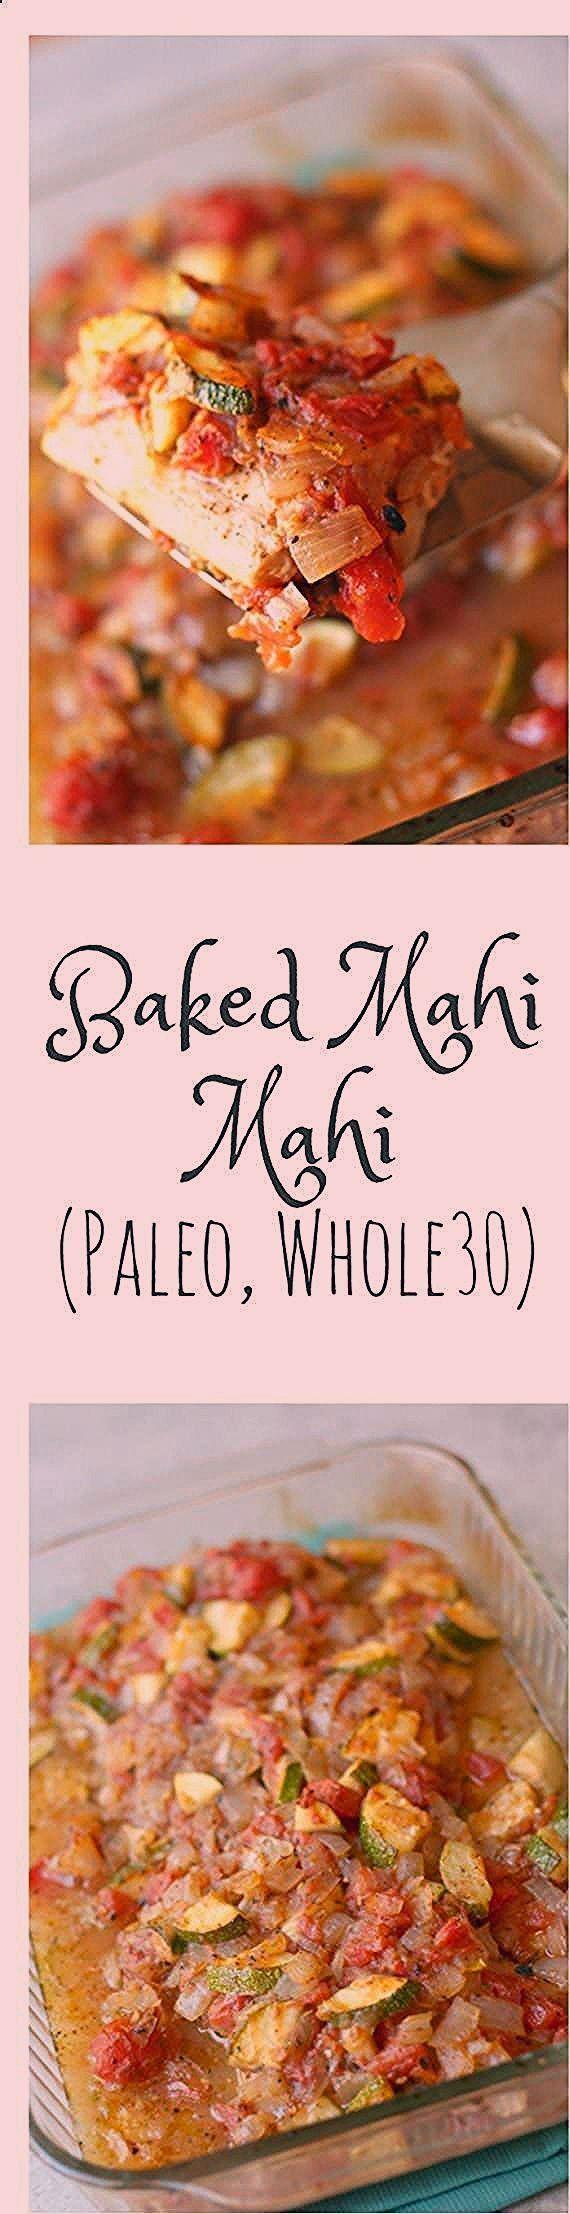 Photo of Baked Mahi Mahi with Vegetables (Paleo Whole30) snaper fish recipes;tapia fish